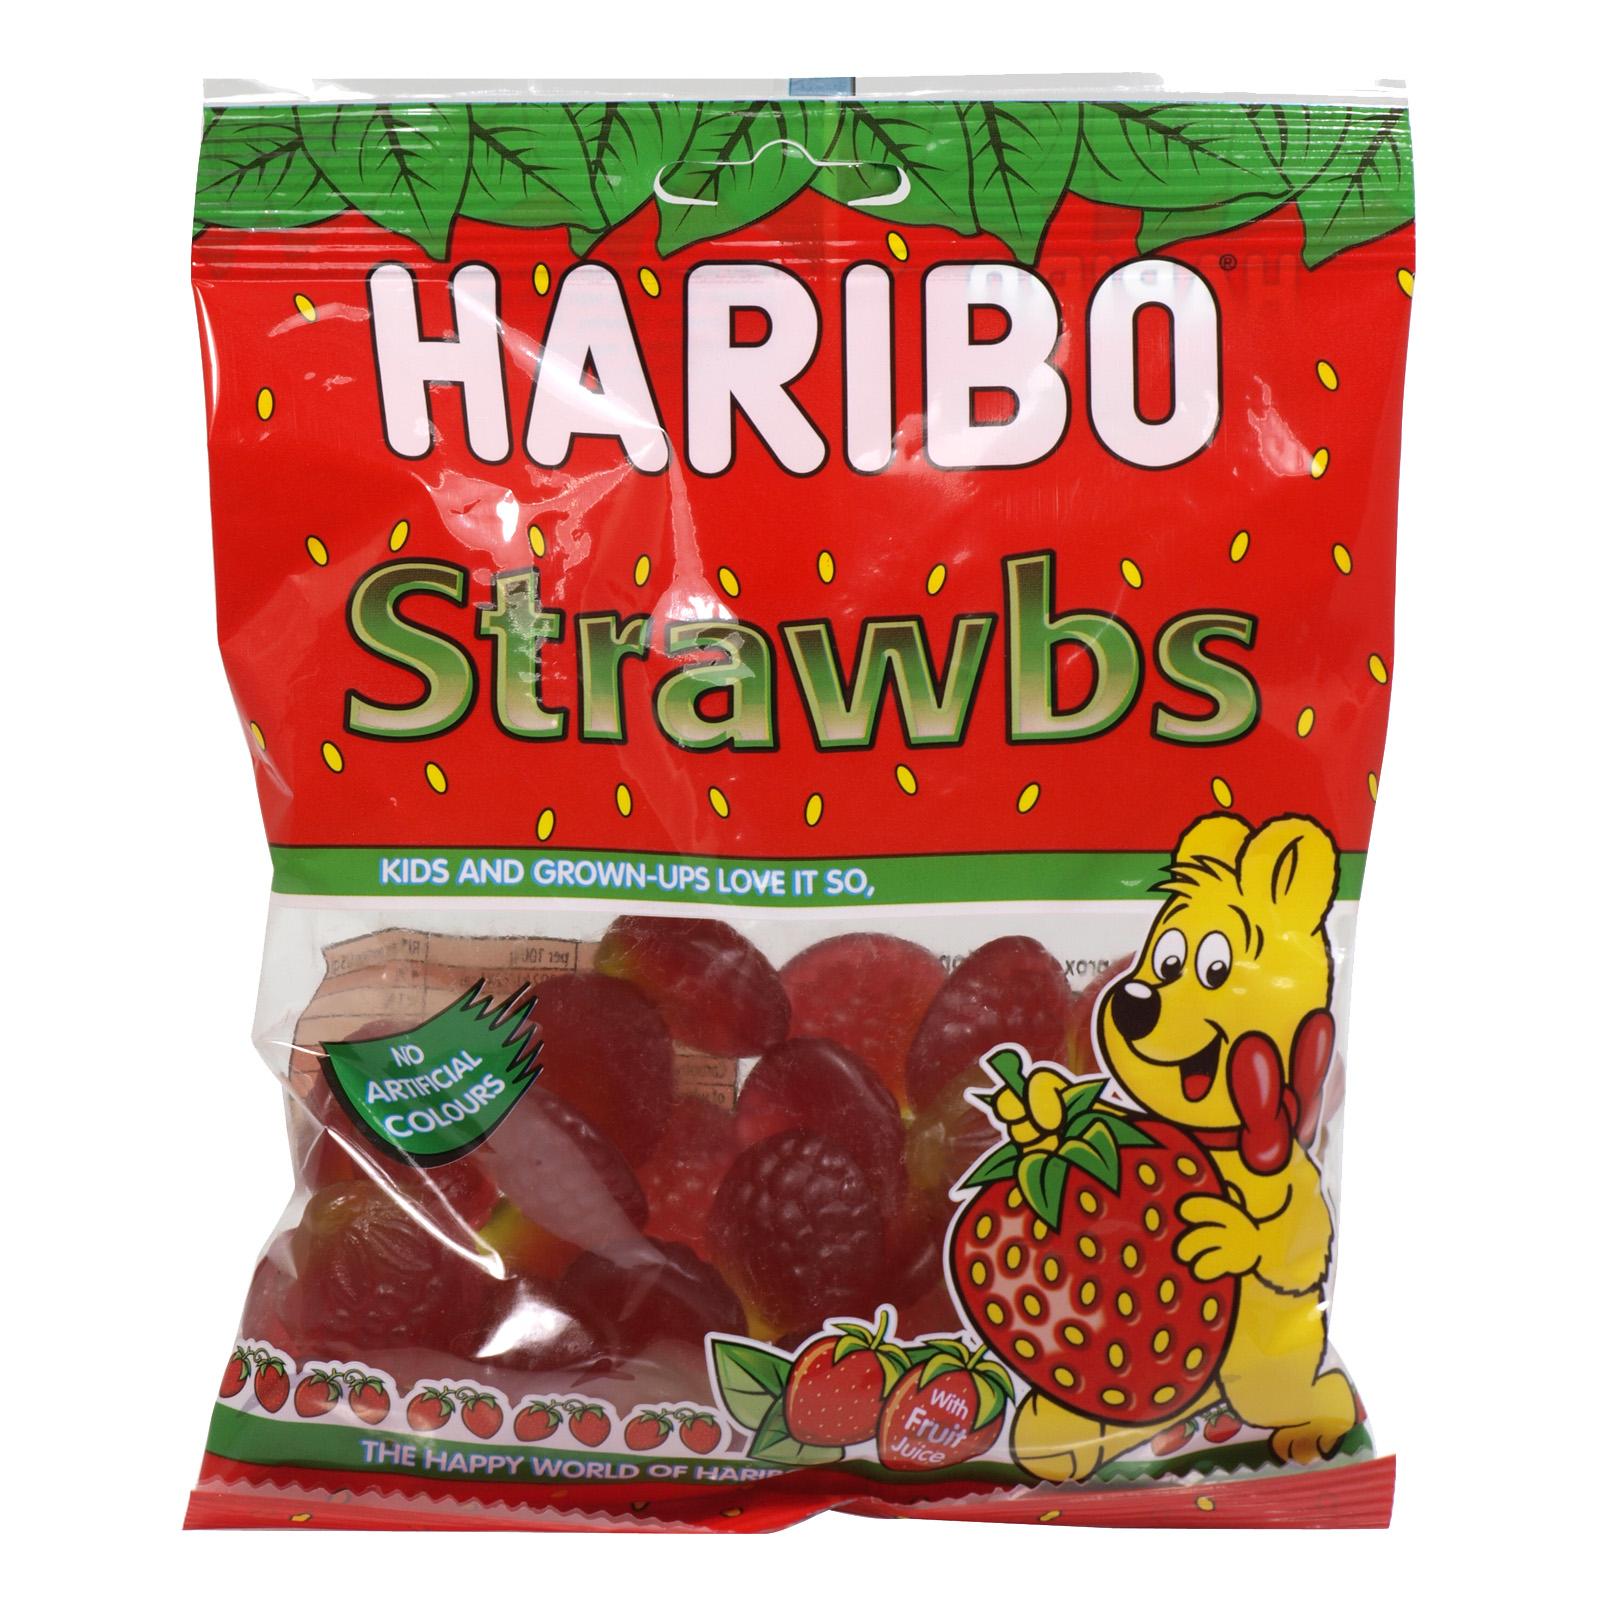 HARIBO 140GM BAGS SQUIDGY STRAWBERRIES X14